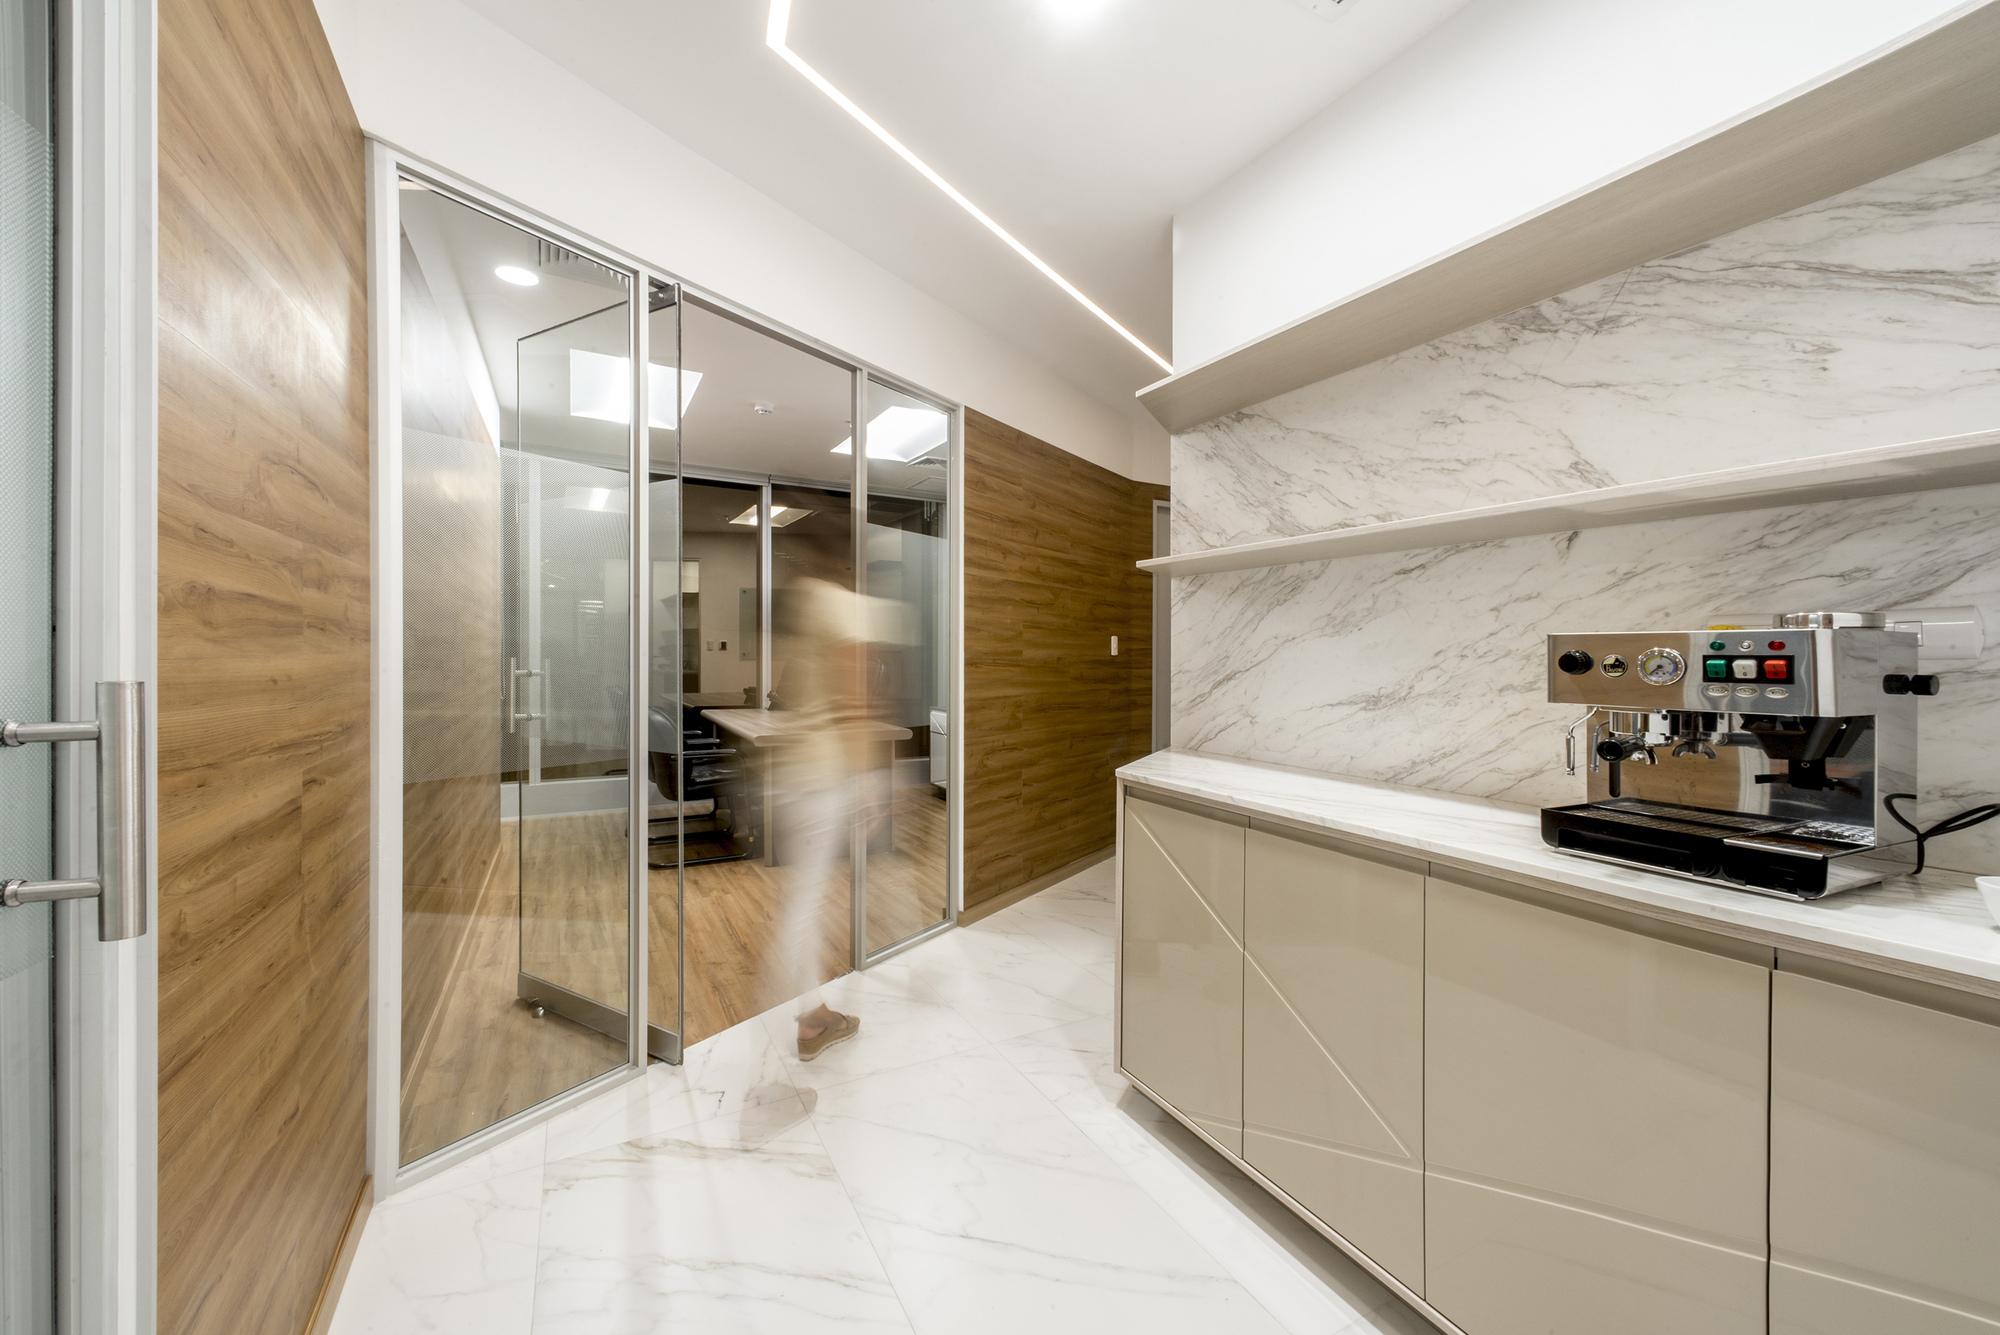 Oficina edificio panorama baum studio archdaily colombia for Diseno de interiores de oficinas ejecutivas